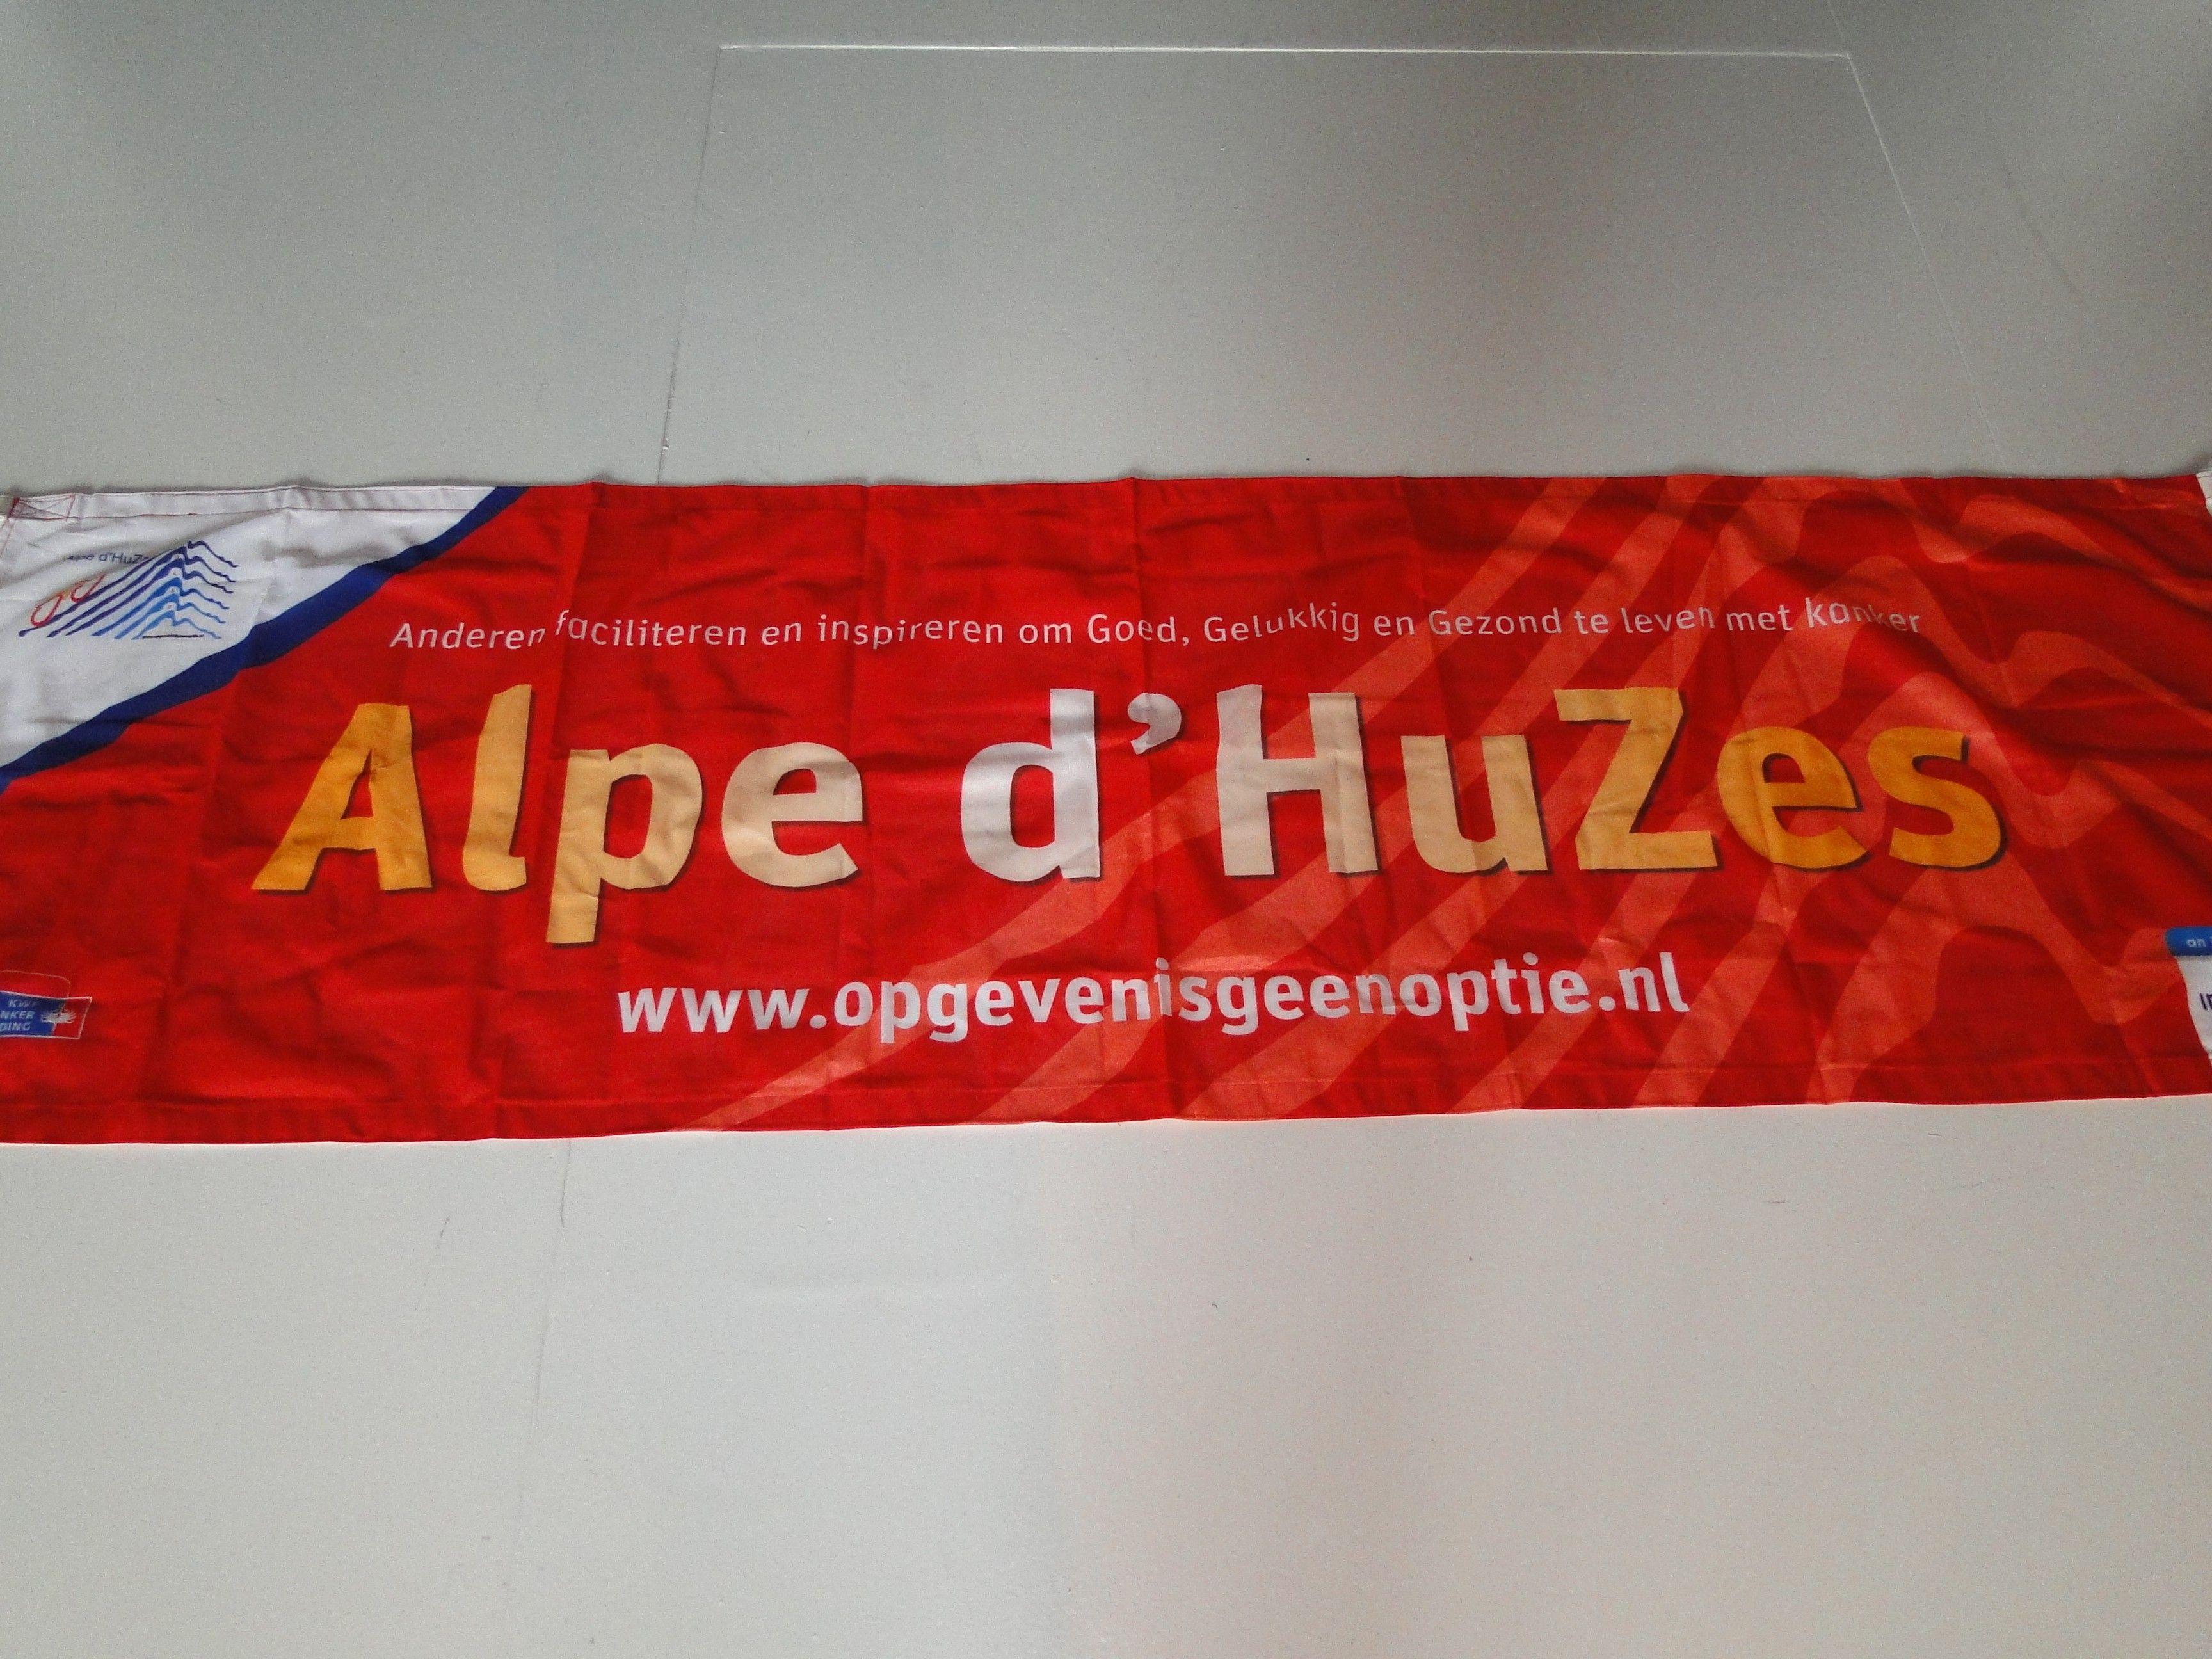 Alpe d'HuZes banner